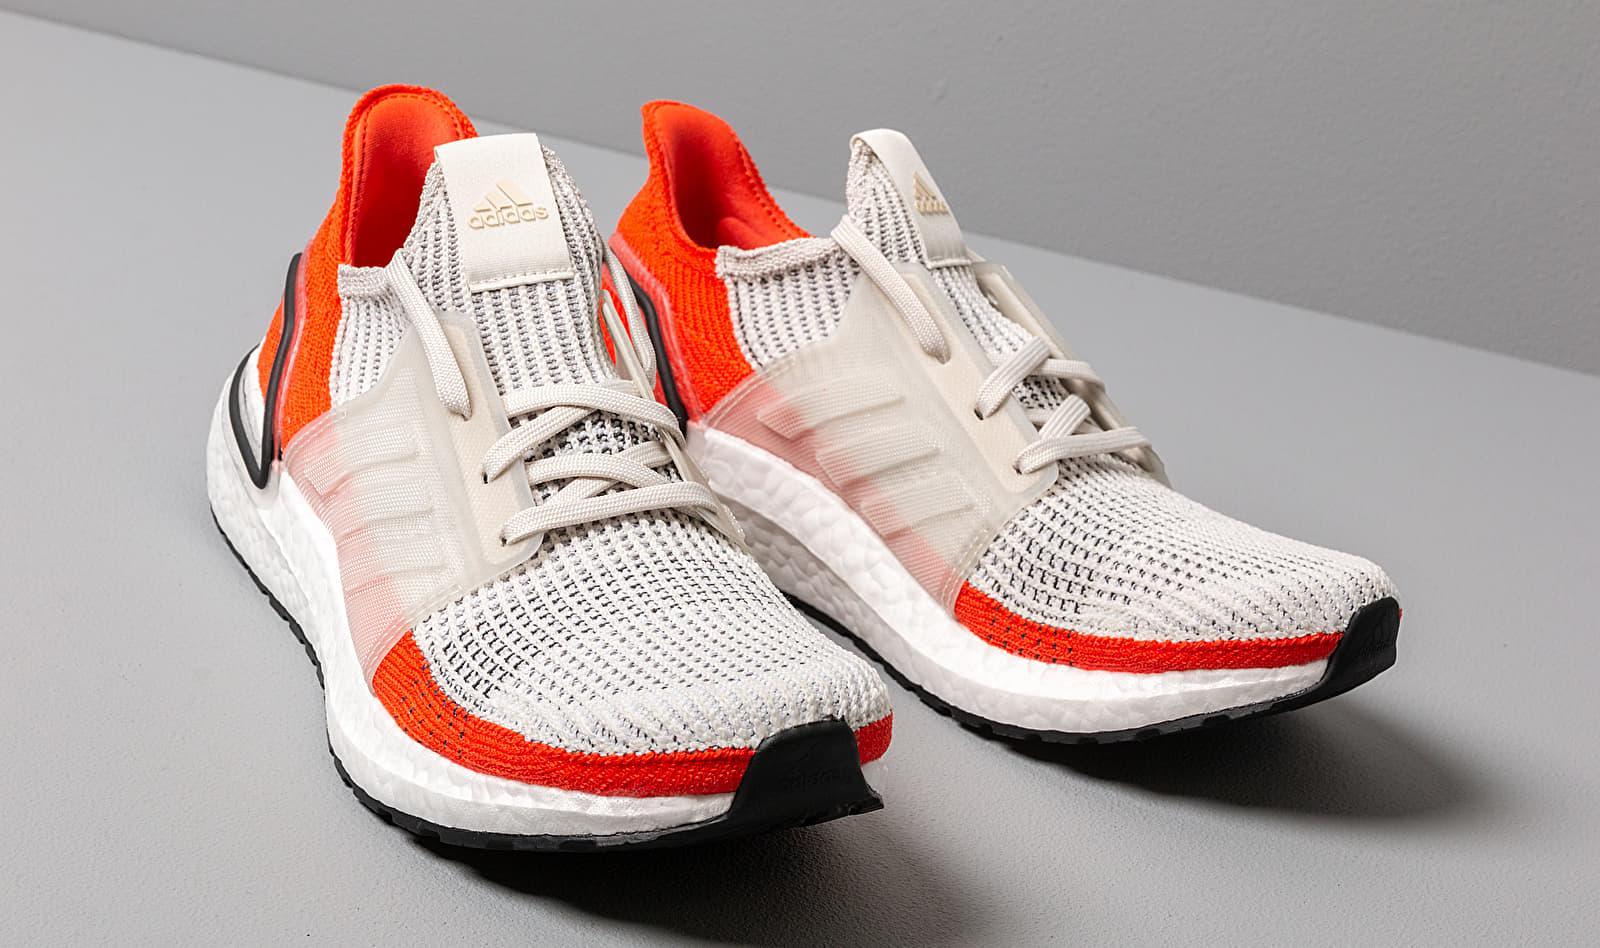 Adidas Ultraboost 19 Raw White/ Ftw White/ Active Orange